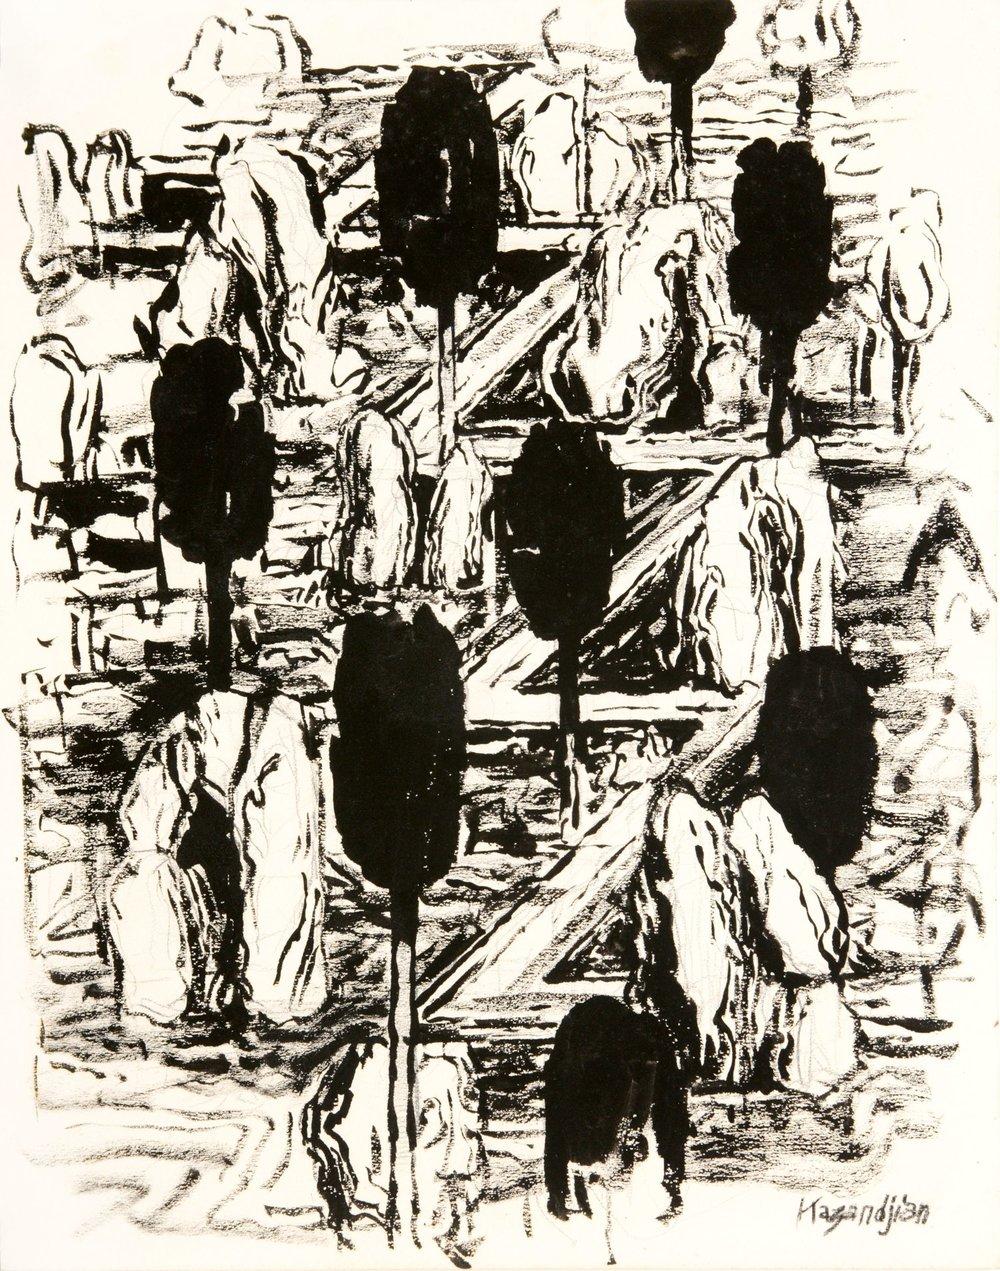 UNTITLED- 1997